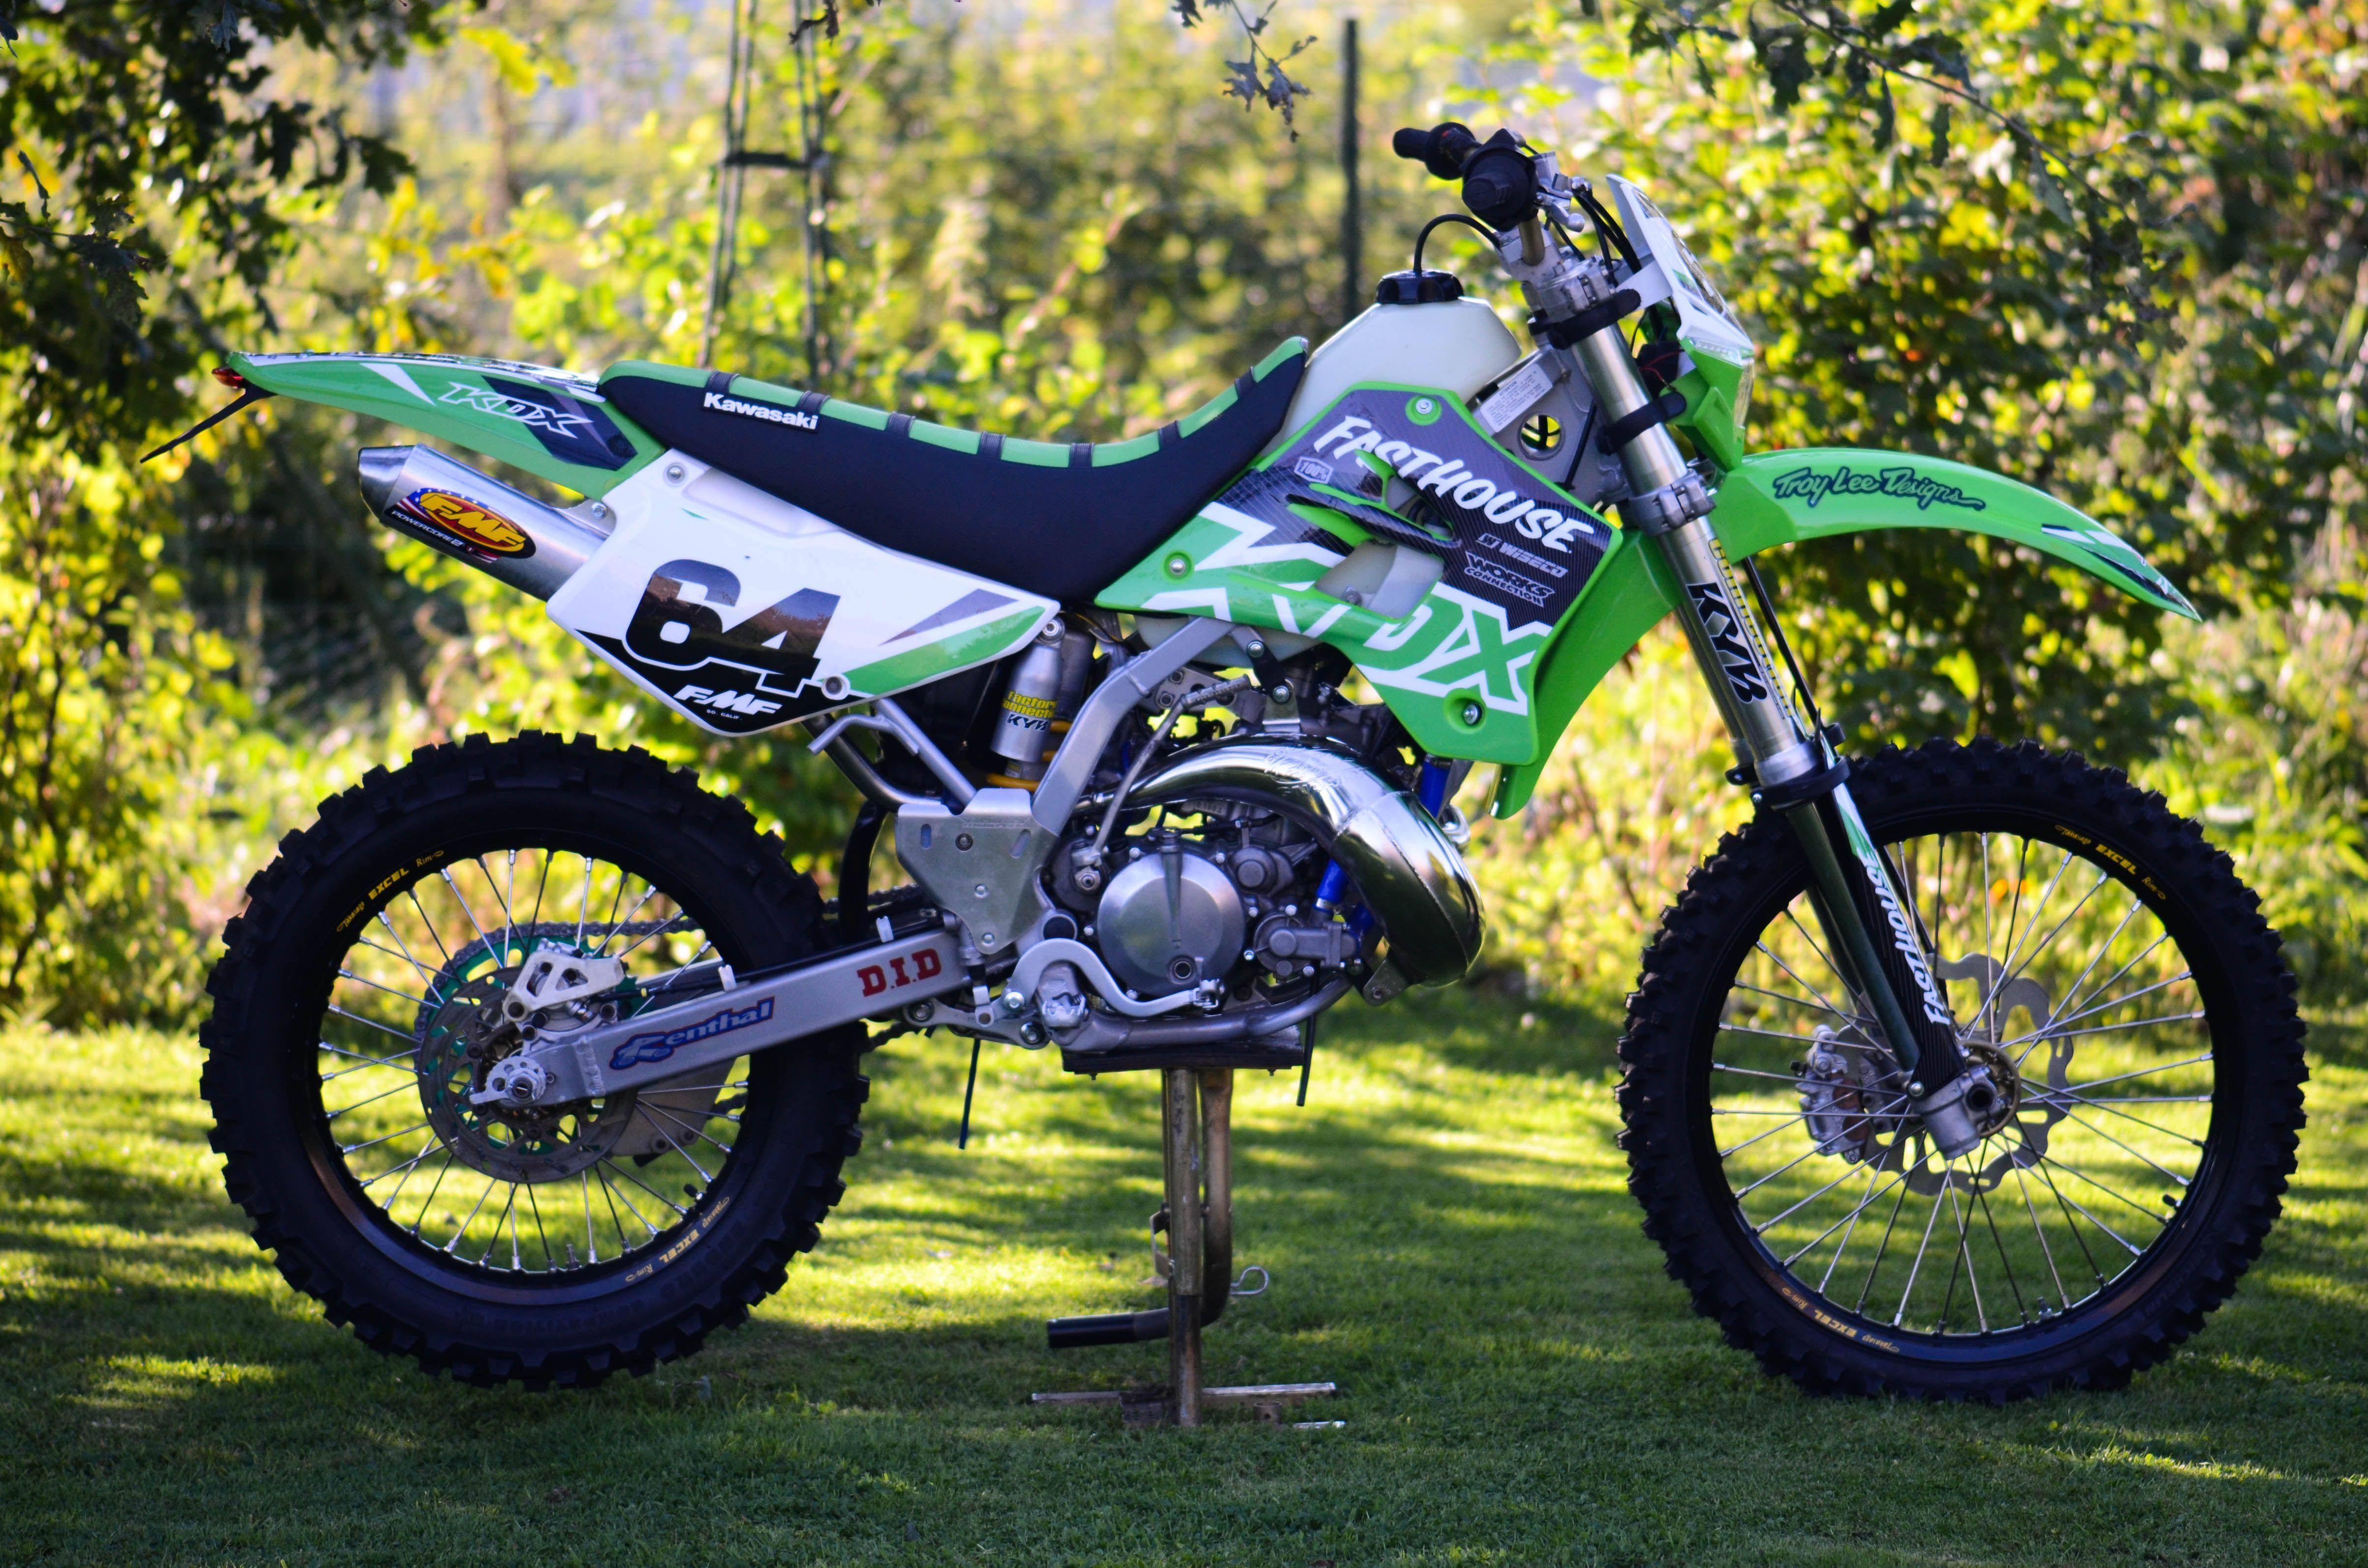 96 Kawasaki Kdx200 Rebuild Cedric Simon Derestricted